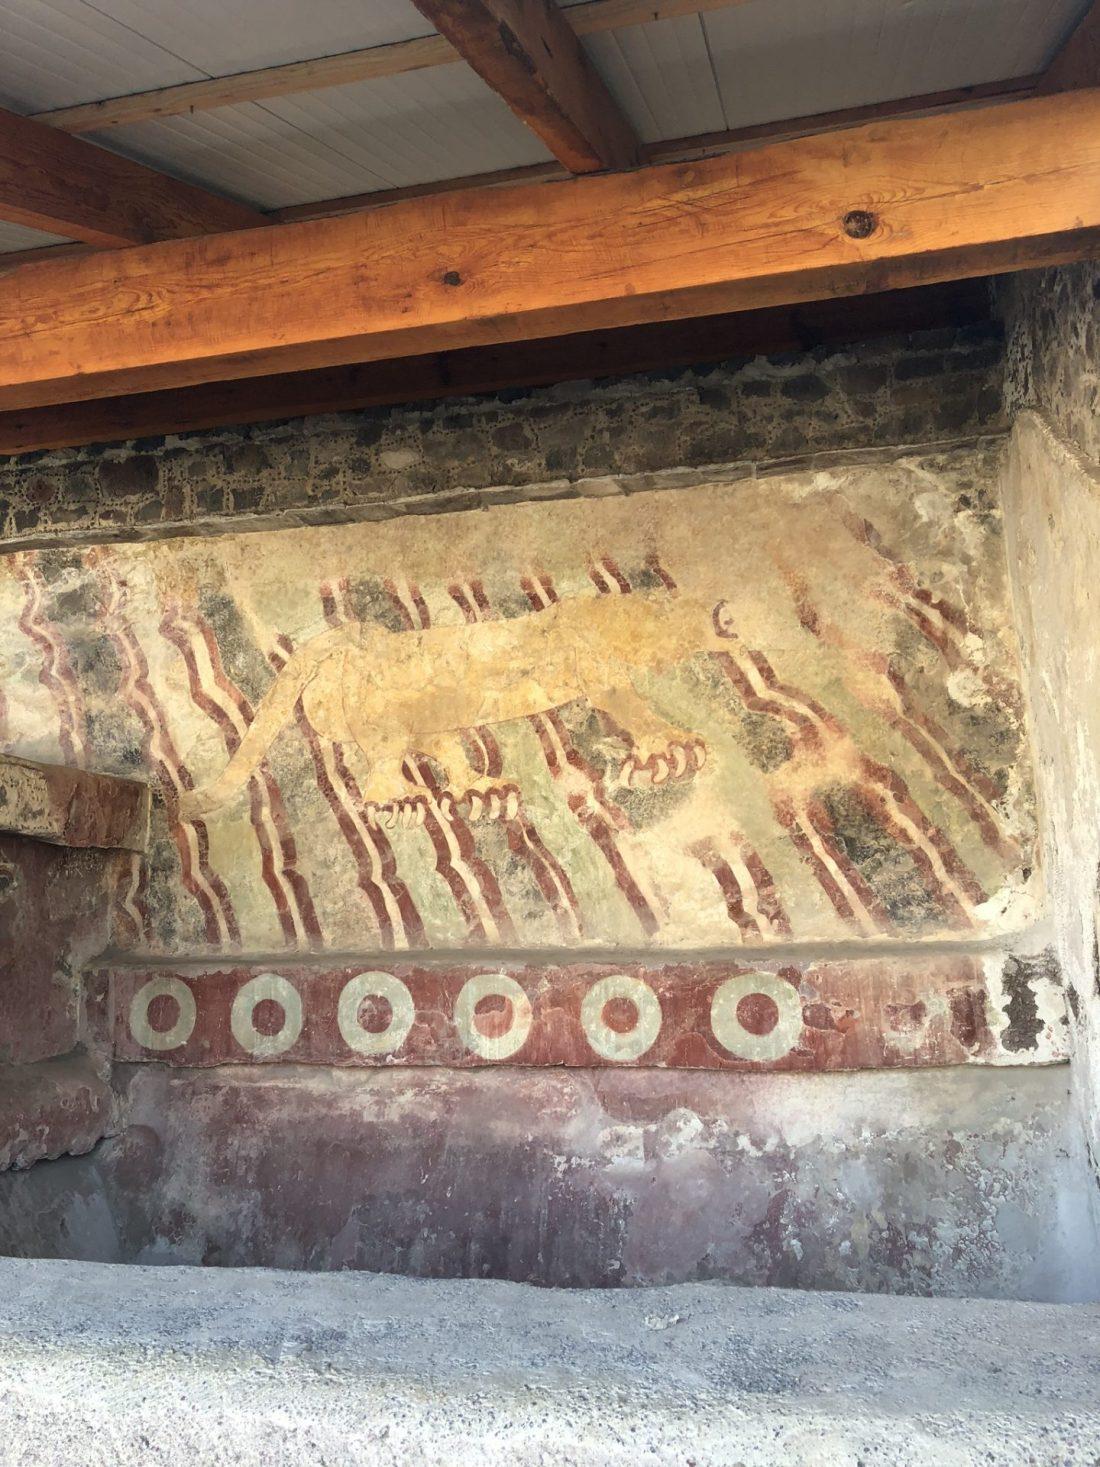 Mayan hieroglyphics